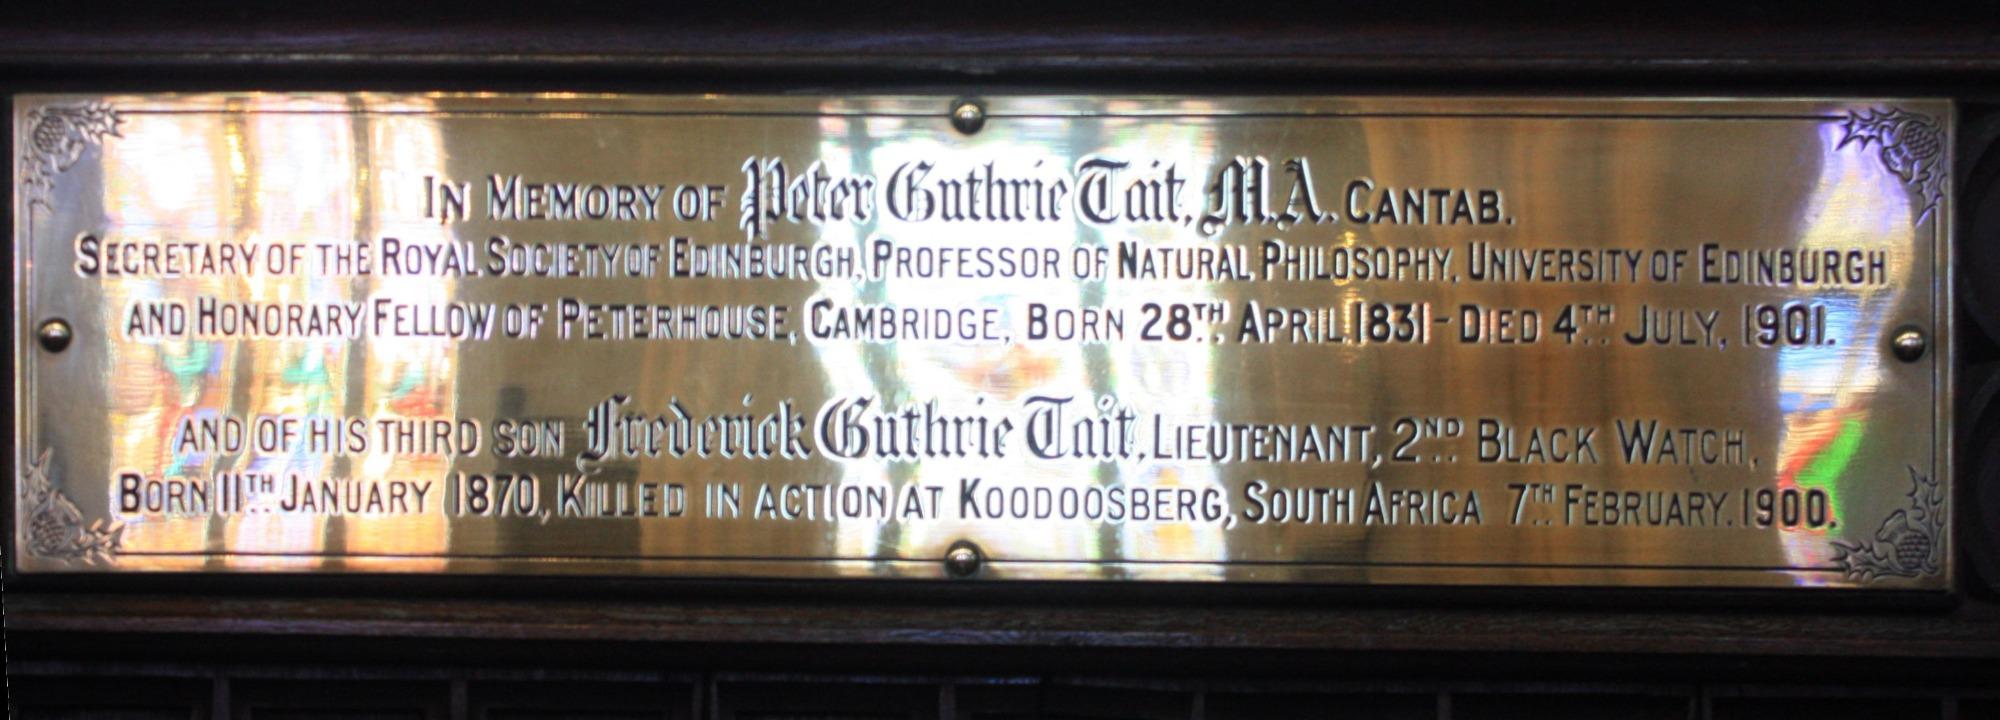 Memorial_plaque_to_Peter_Guthrie_Tait_St_Johns_Episcopal_Church_Edinburgh.JPG